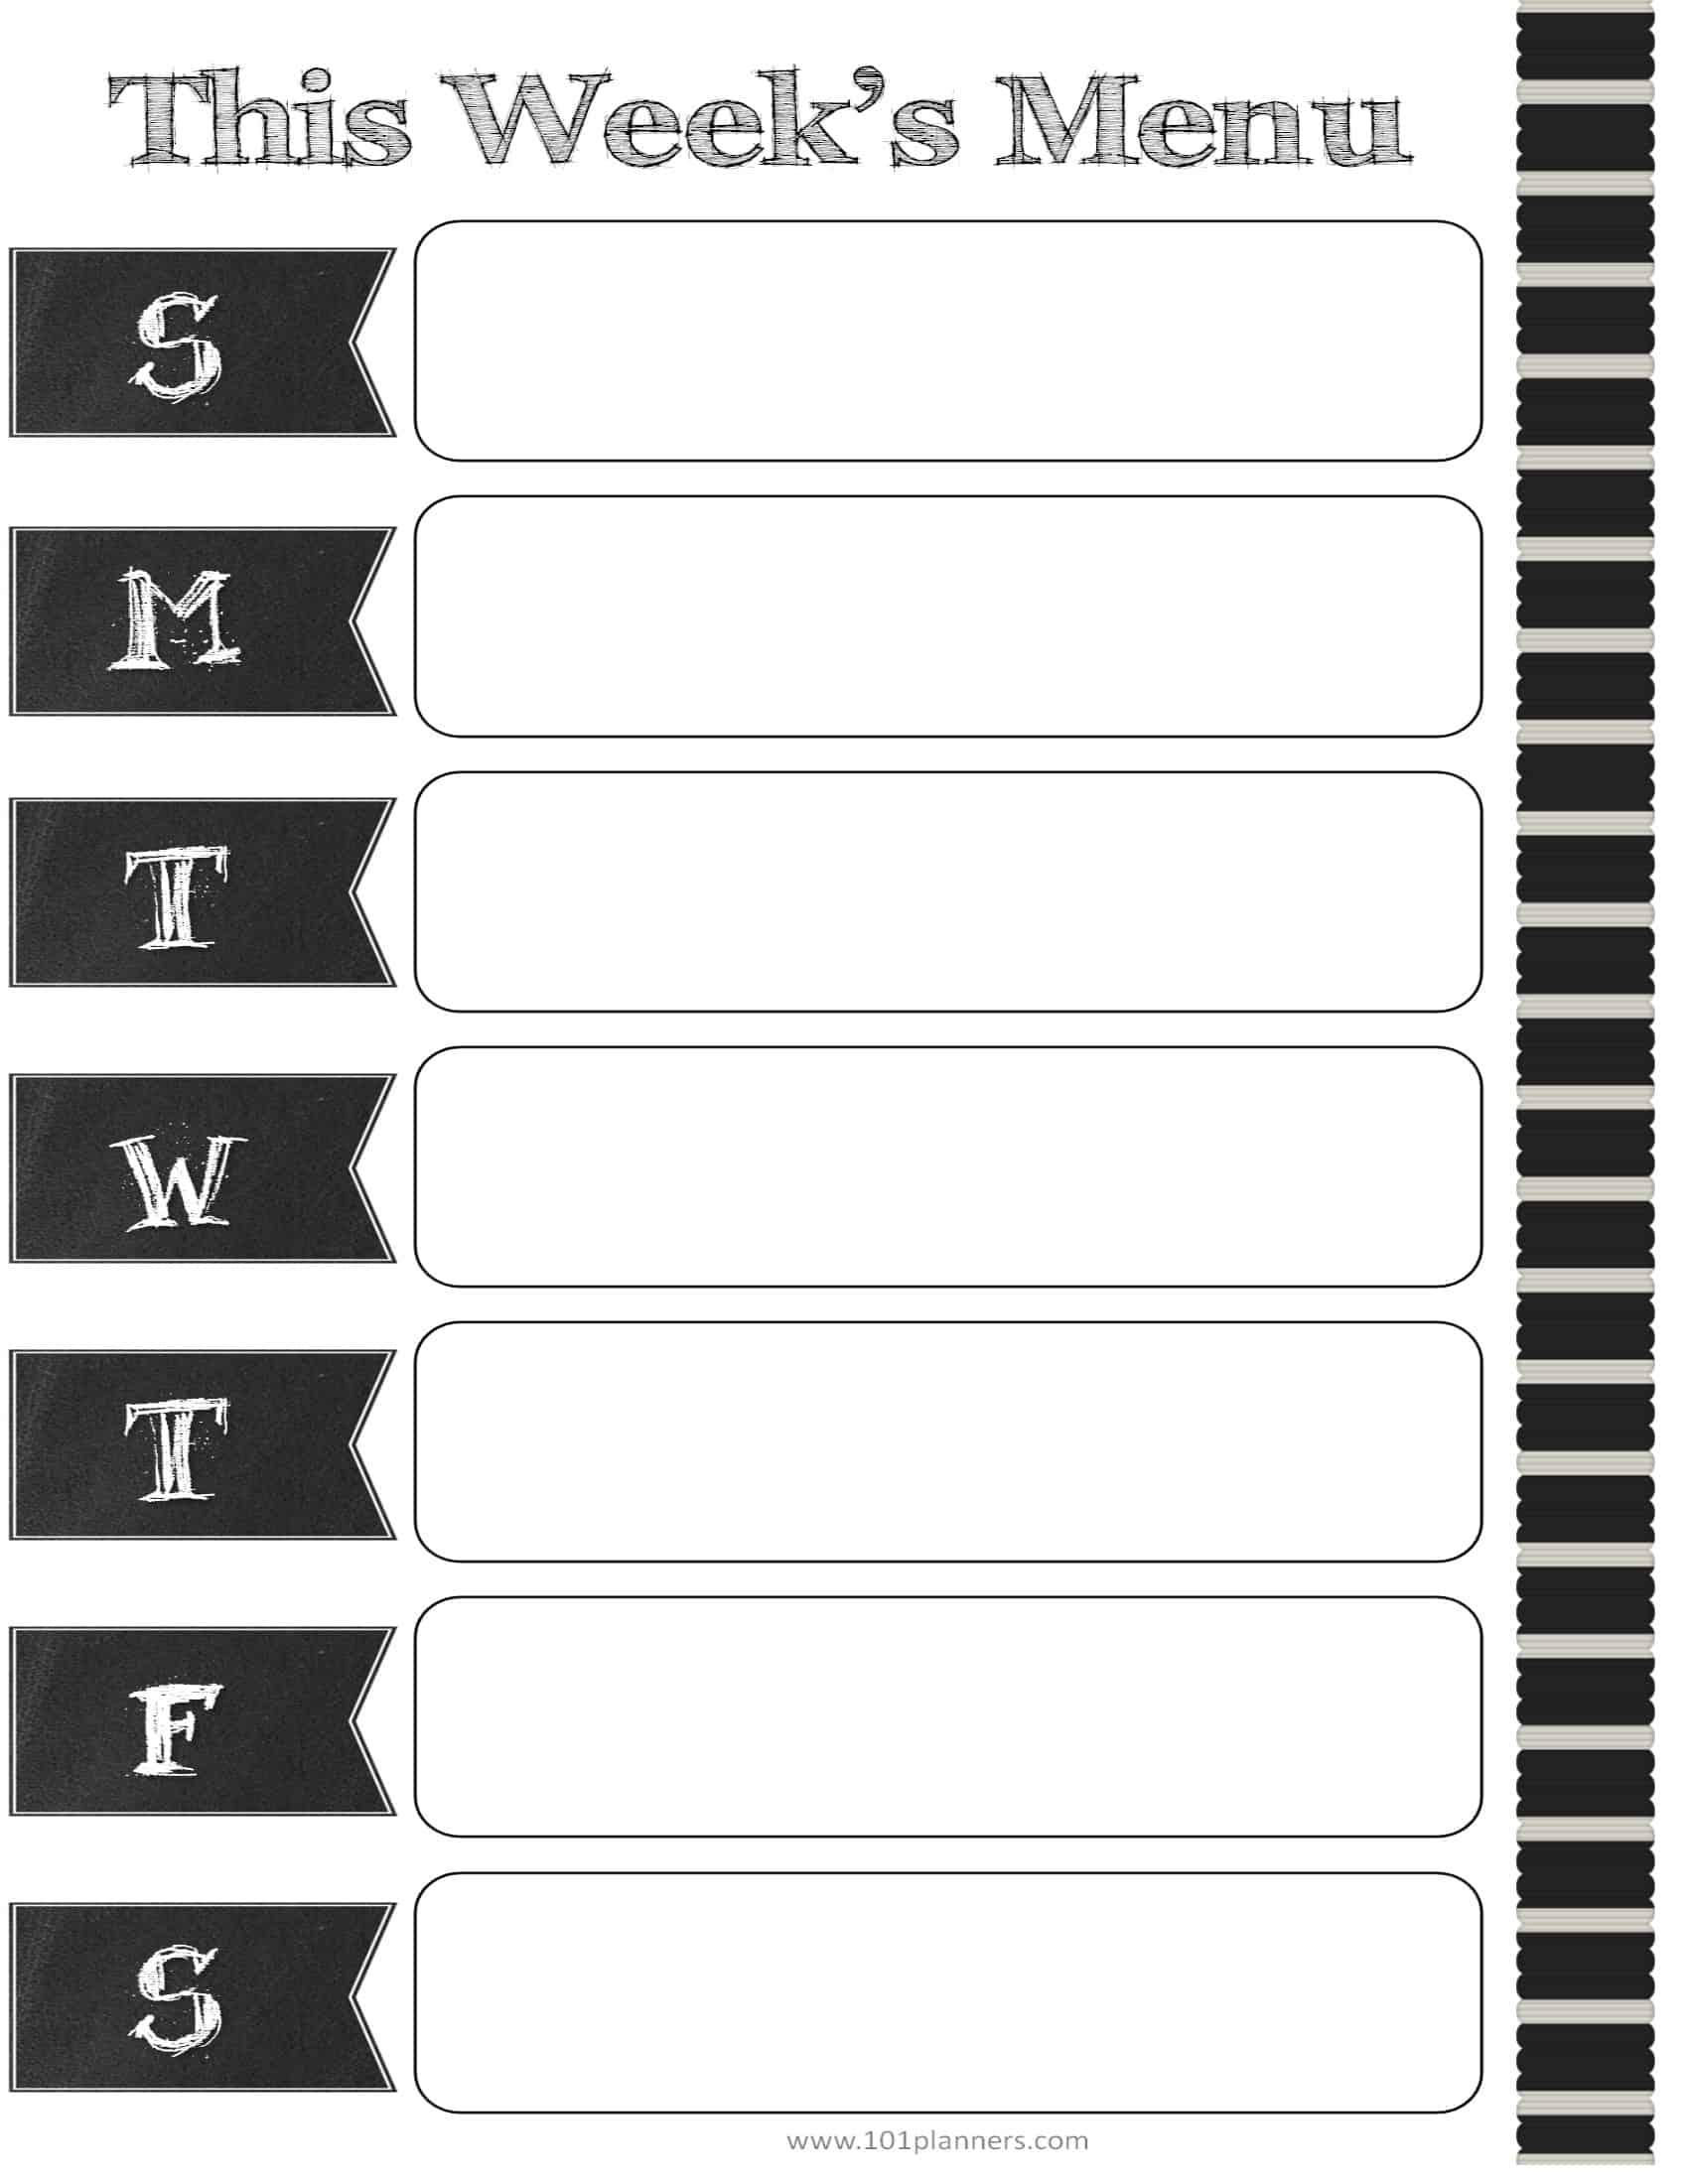 printable calendar for 2015